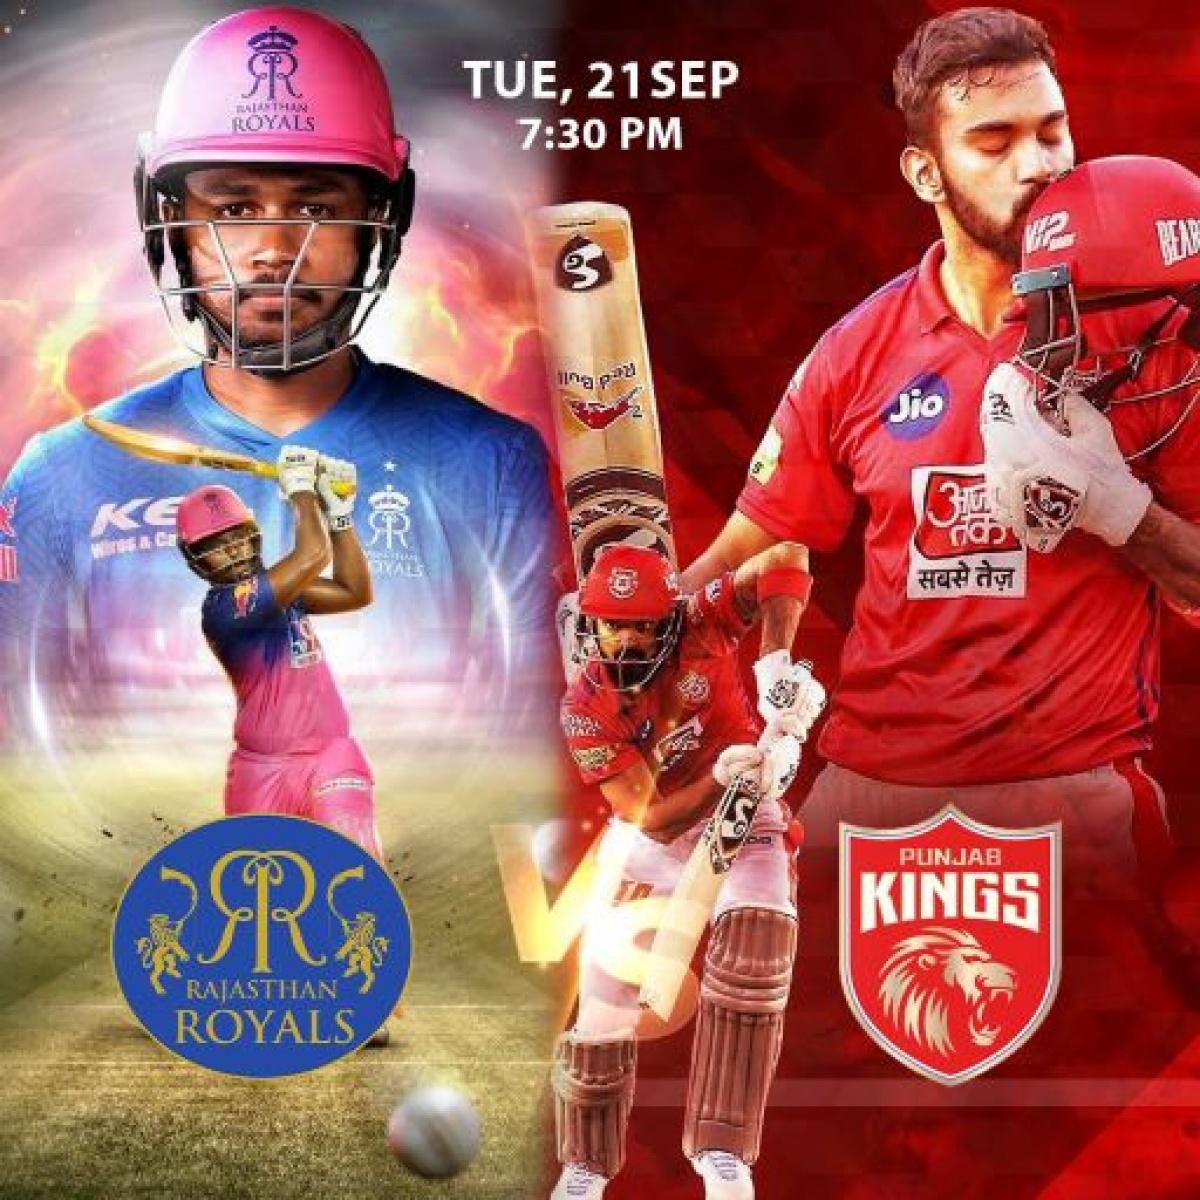 IPL,Indian Premier League,IPL news,IPL Live Score,rajasthan royals,Punjab Kings